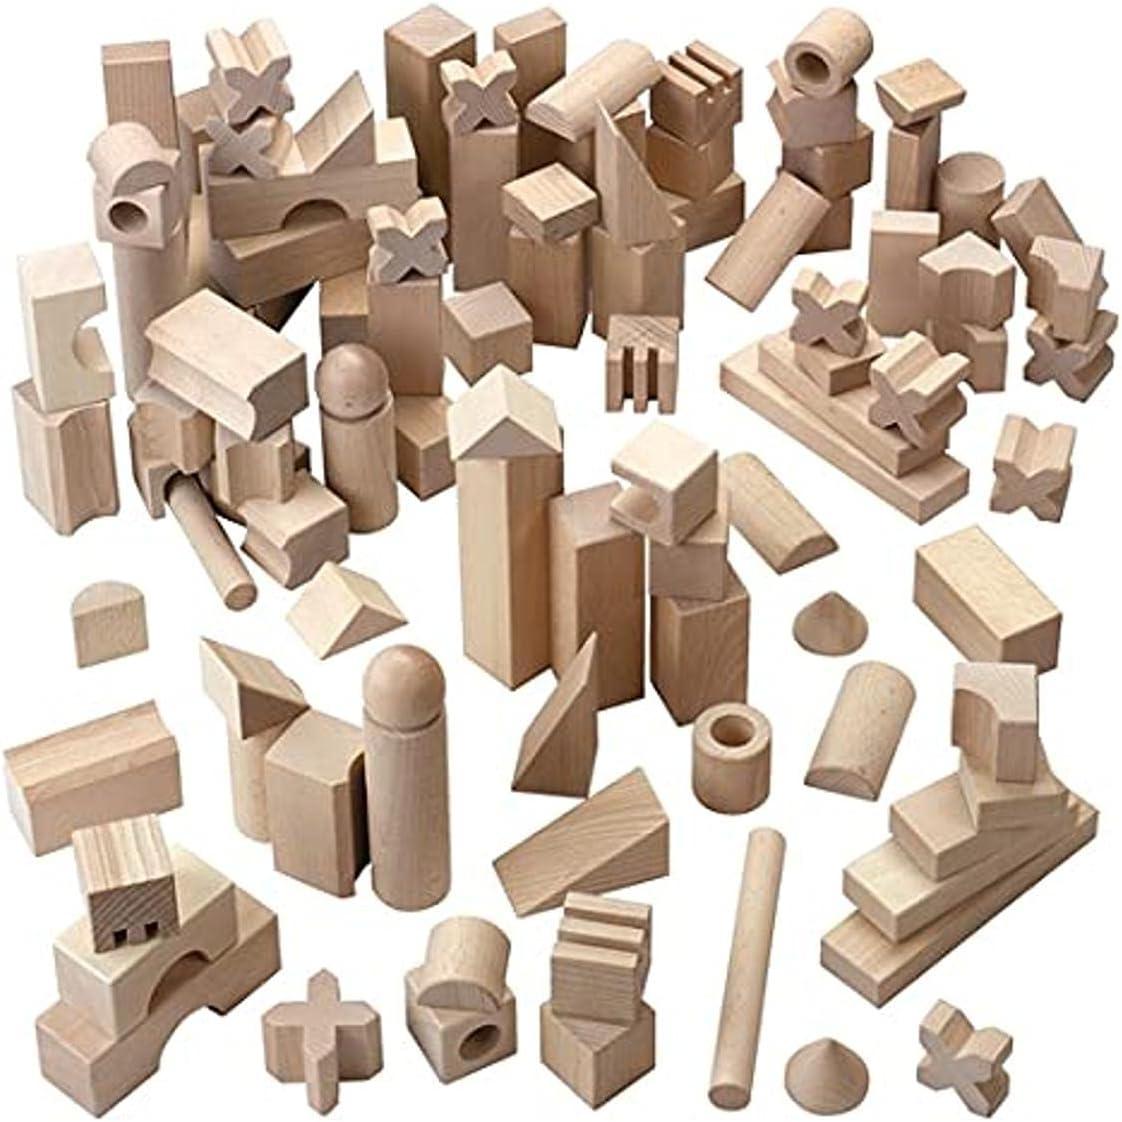 HABA Basic Building Blocks 102 Extra Piece Max 69% OFF Wooden Large Starter Manufacturer OFFicial shop